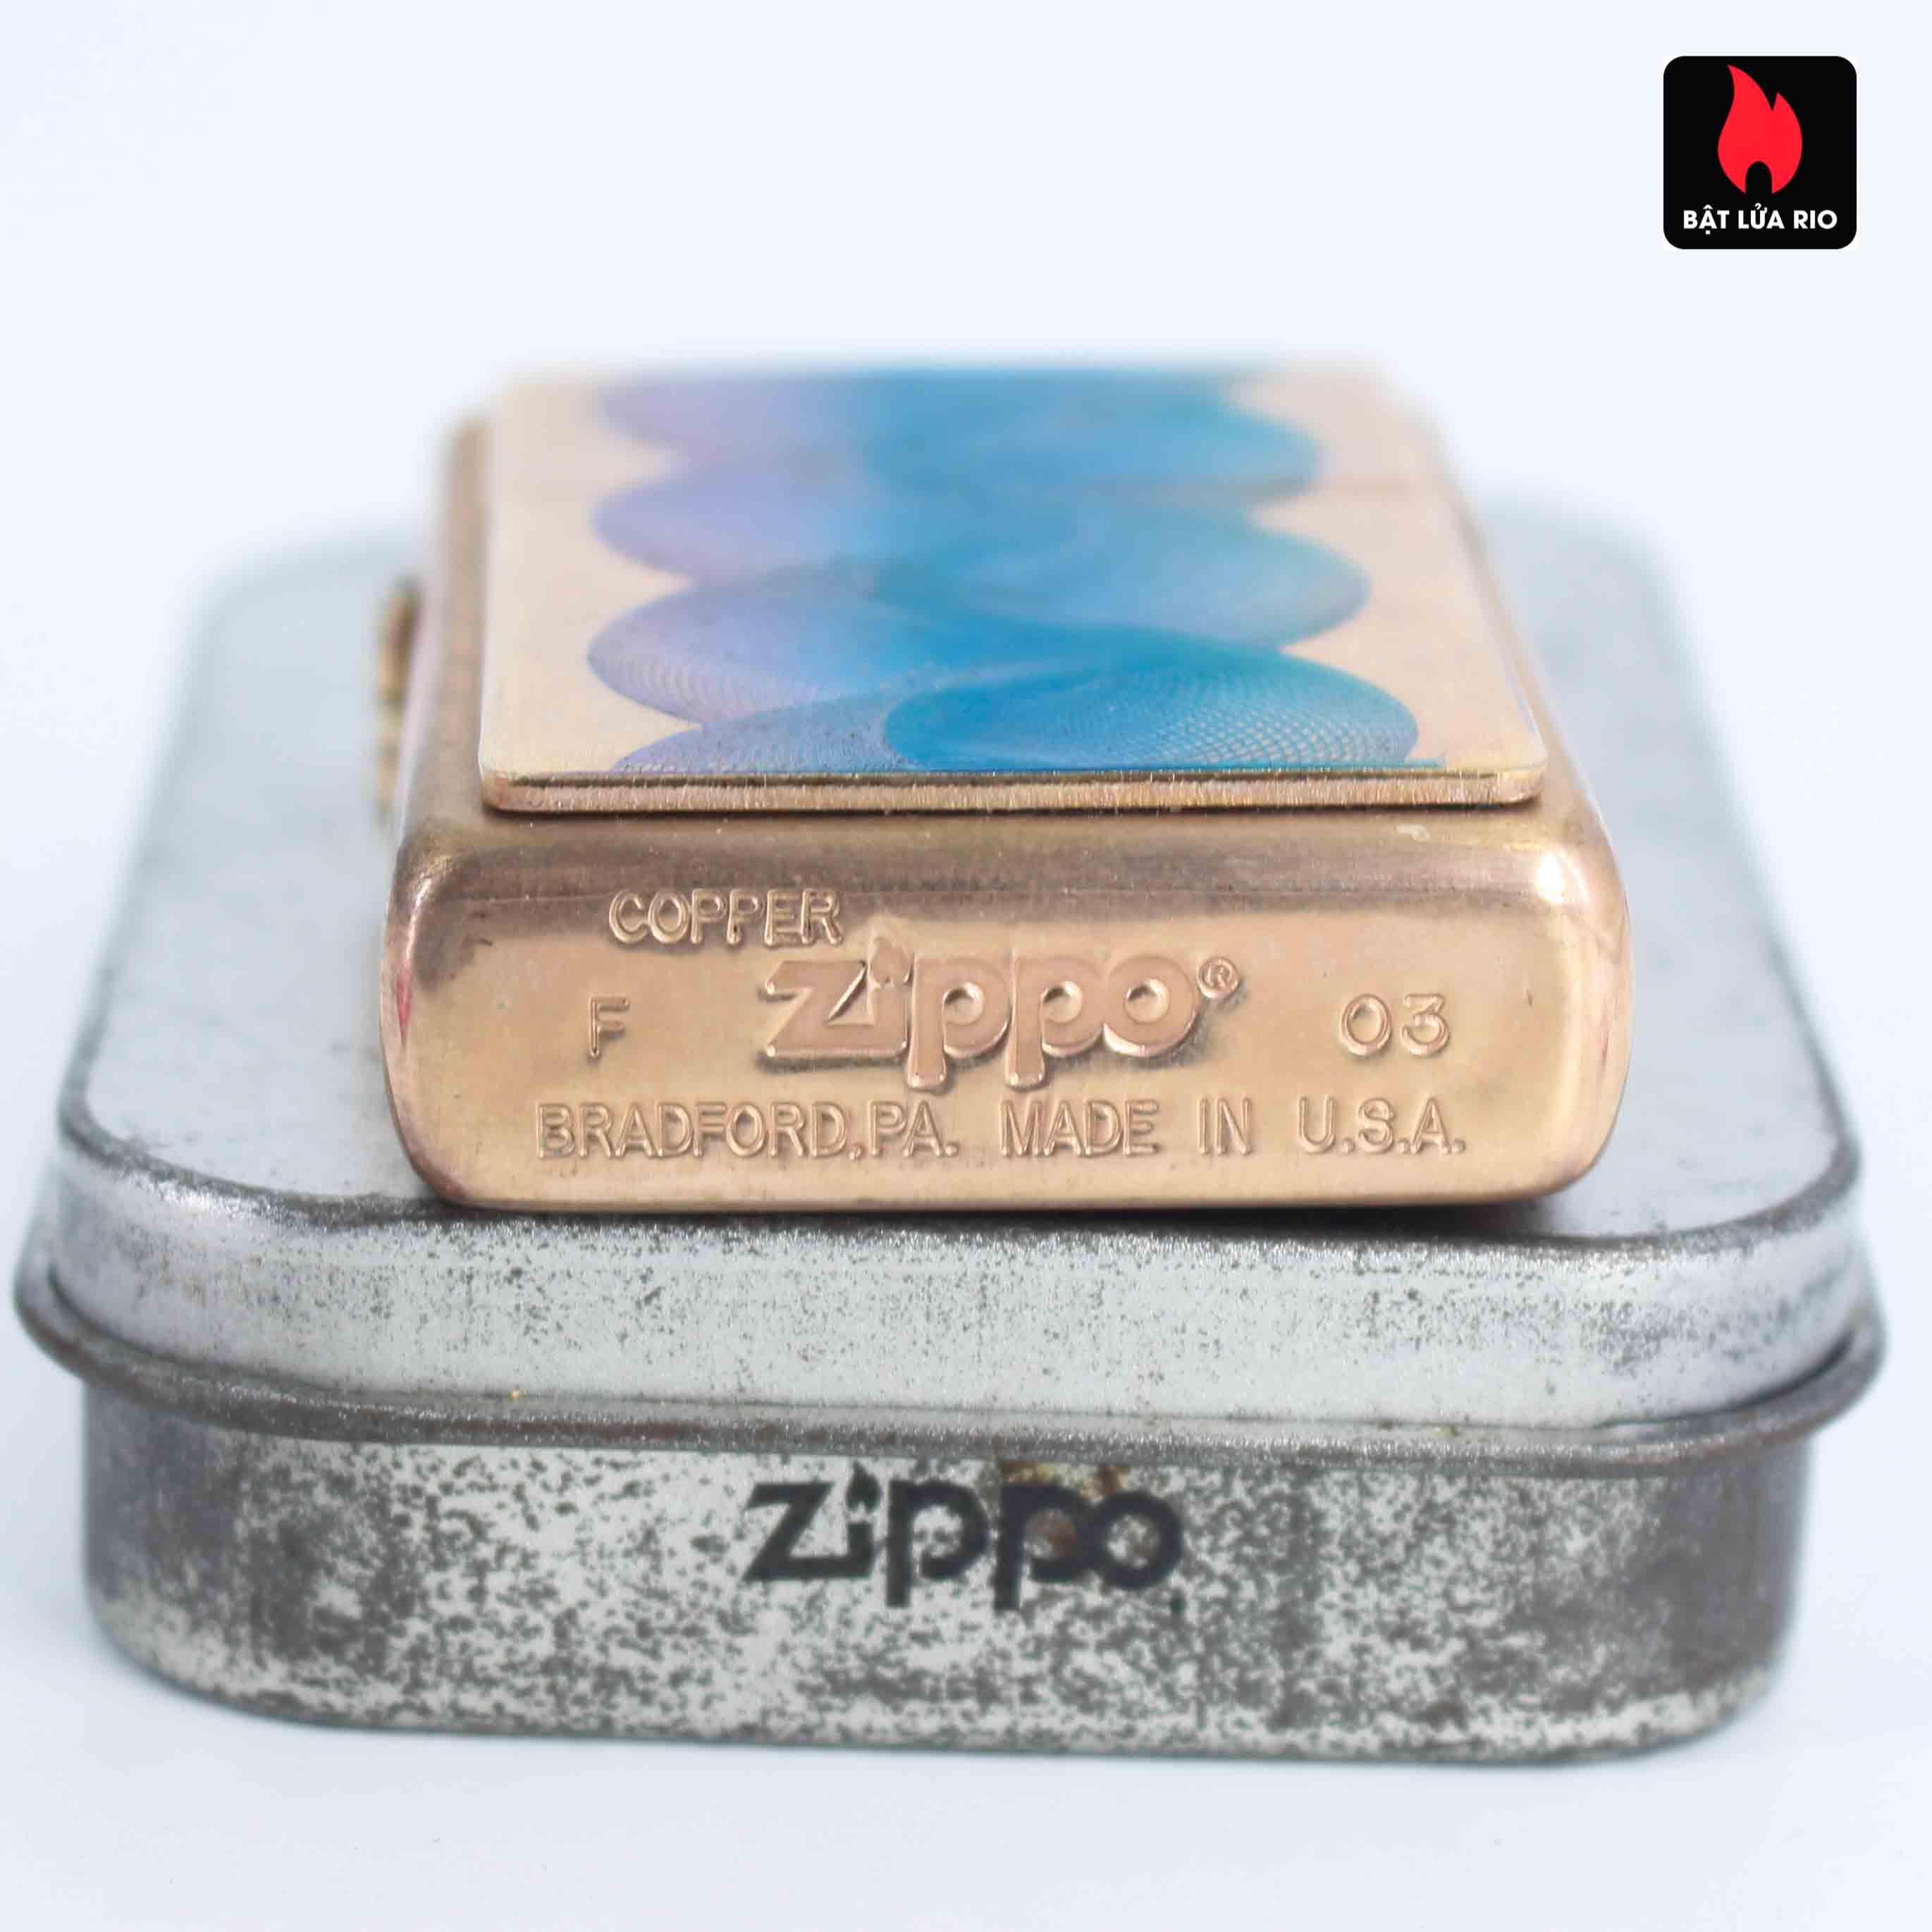 Zippo 2003 - Solid Copper - Phantasma Hand Finished 5